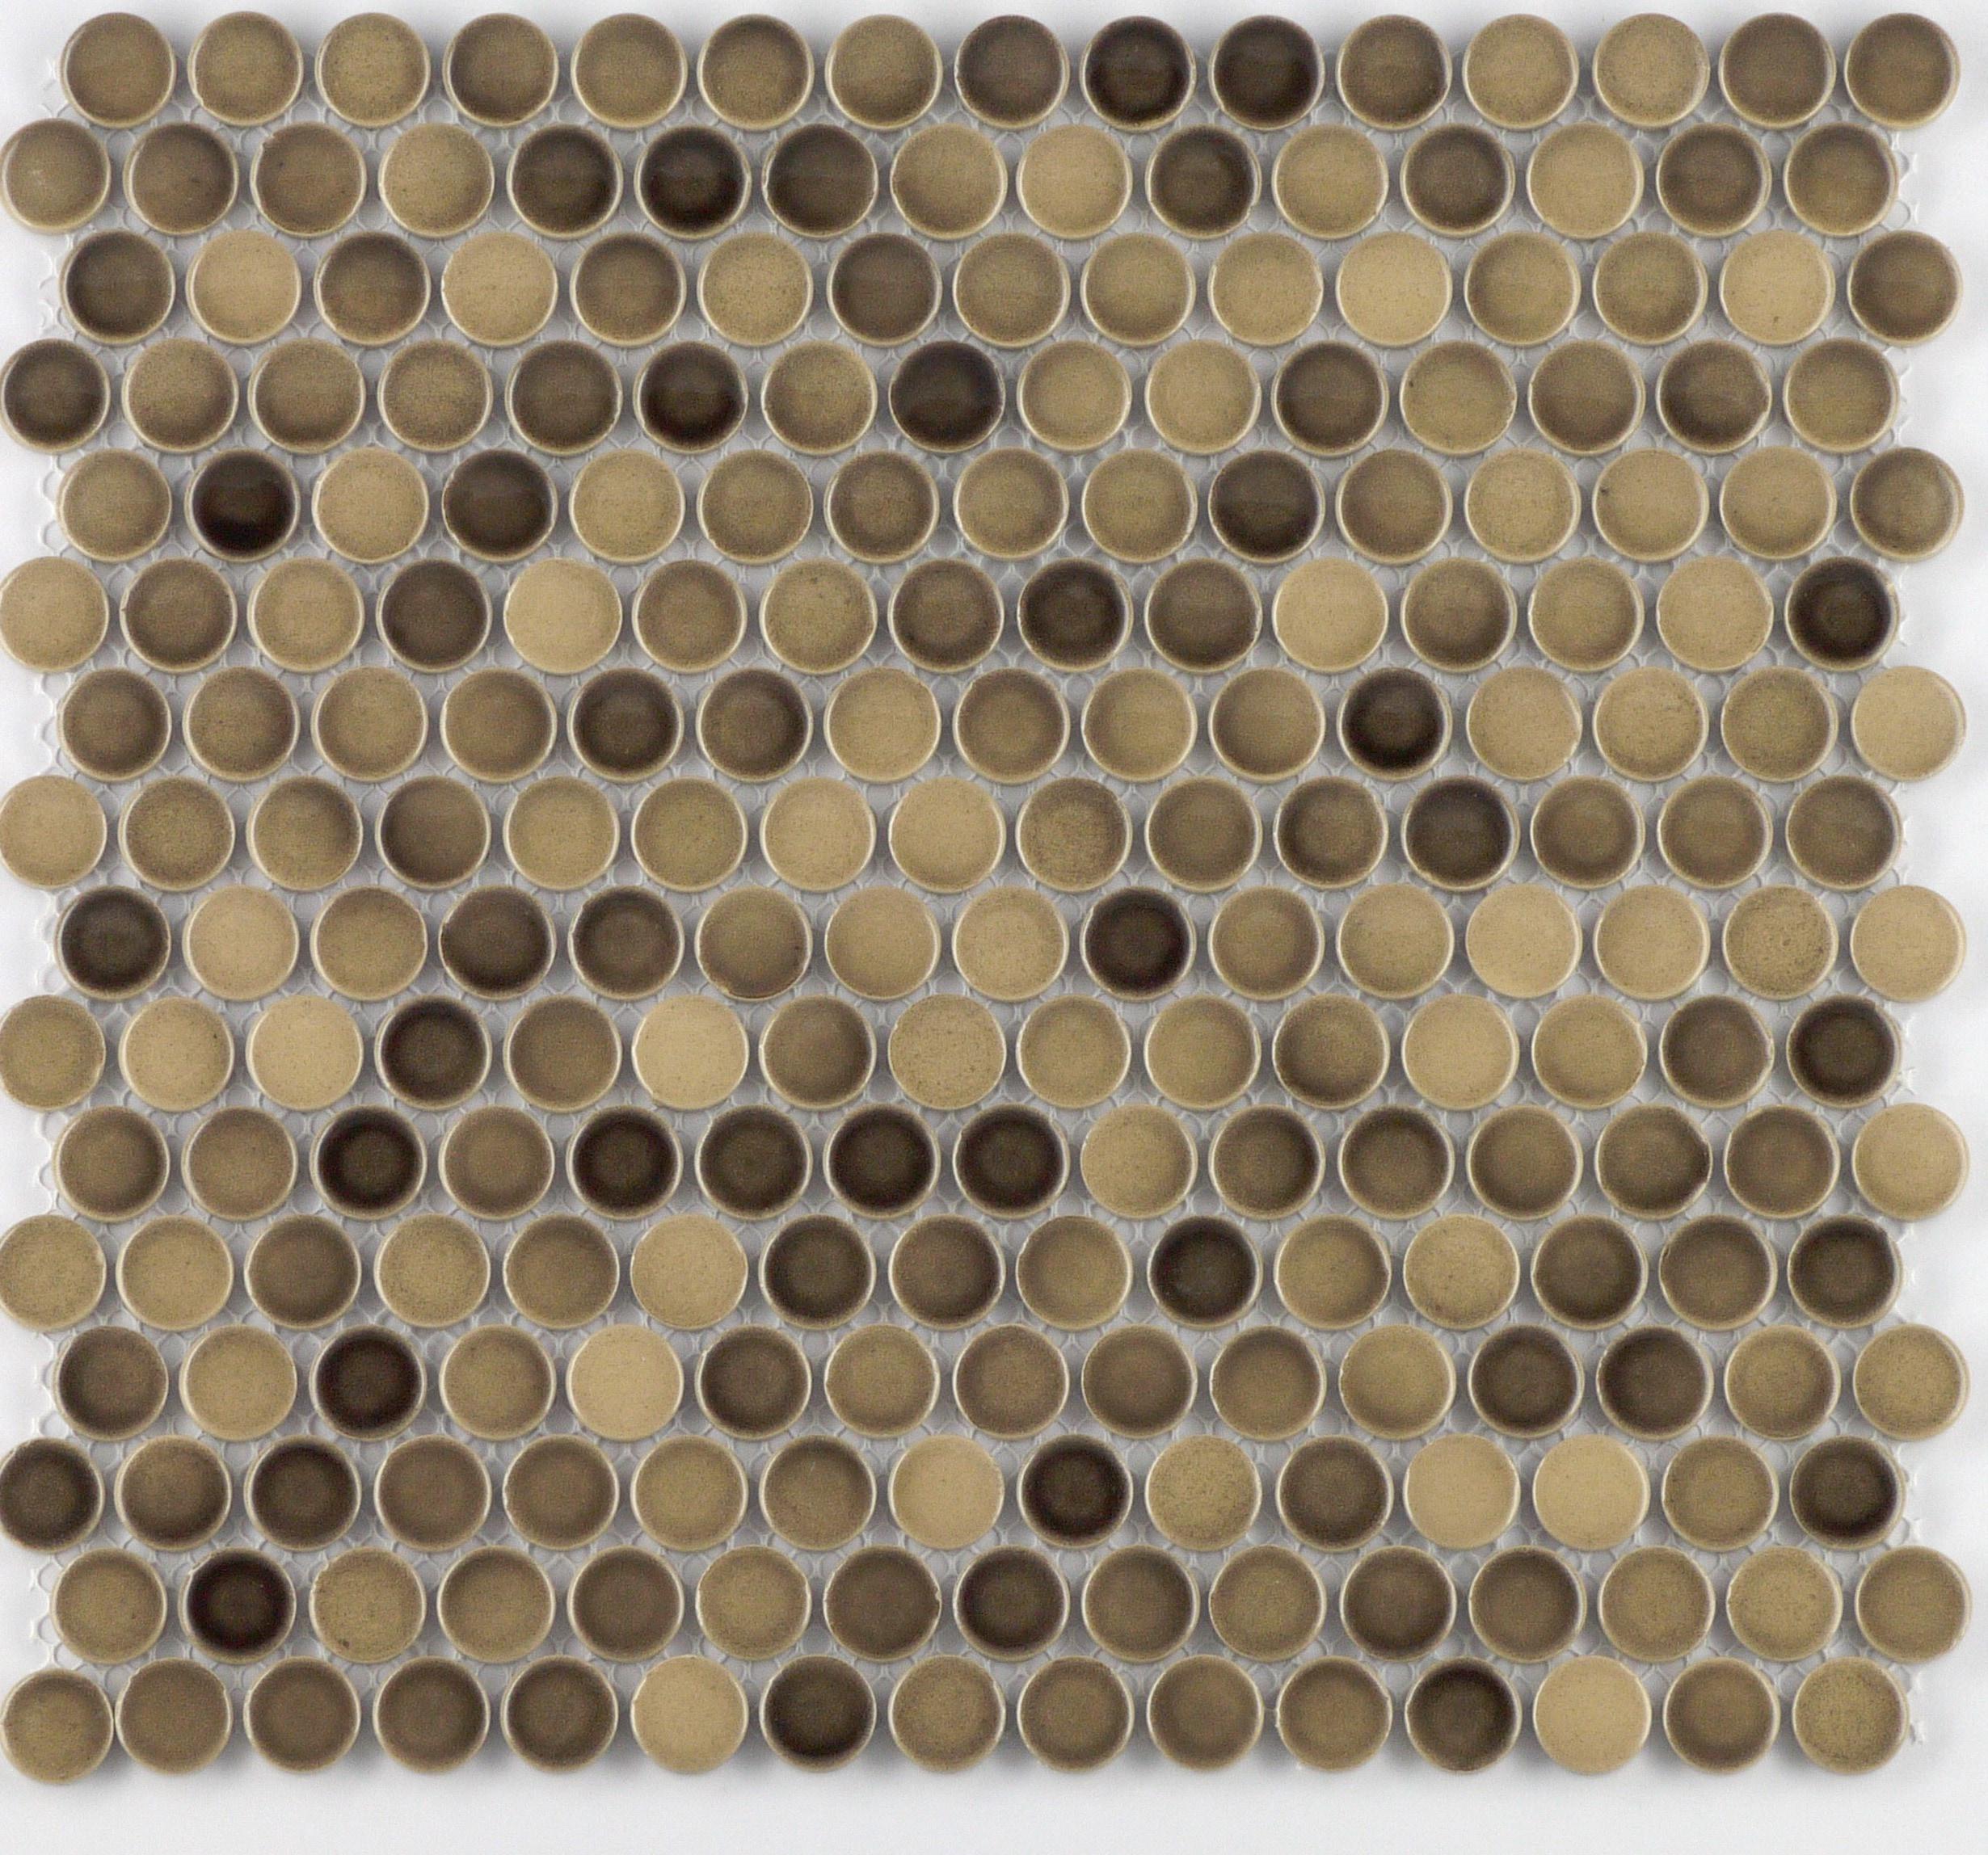 "Latte Gloss Penny / 3/4"" / Glazed Gloss Porcelain Mosaics Penny Rounds 0"